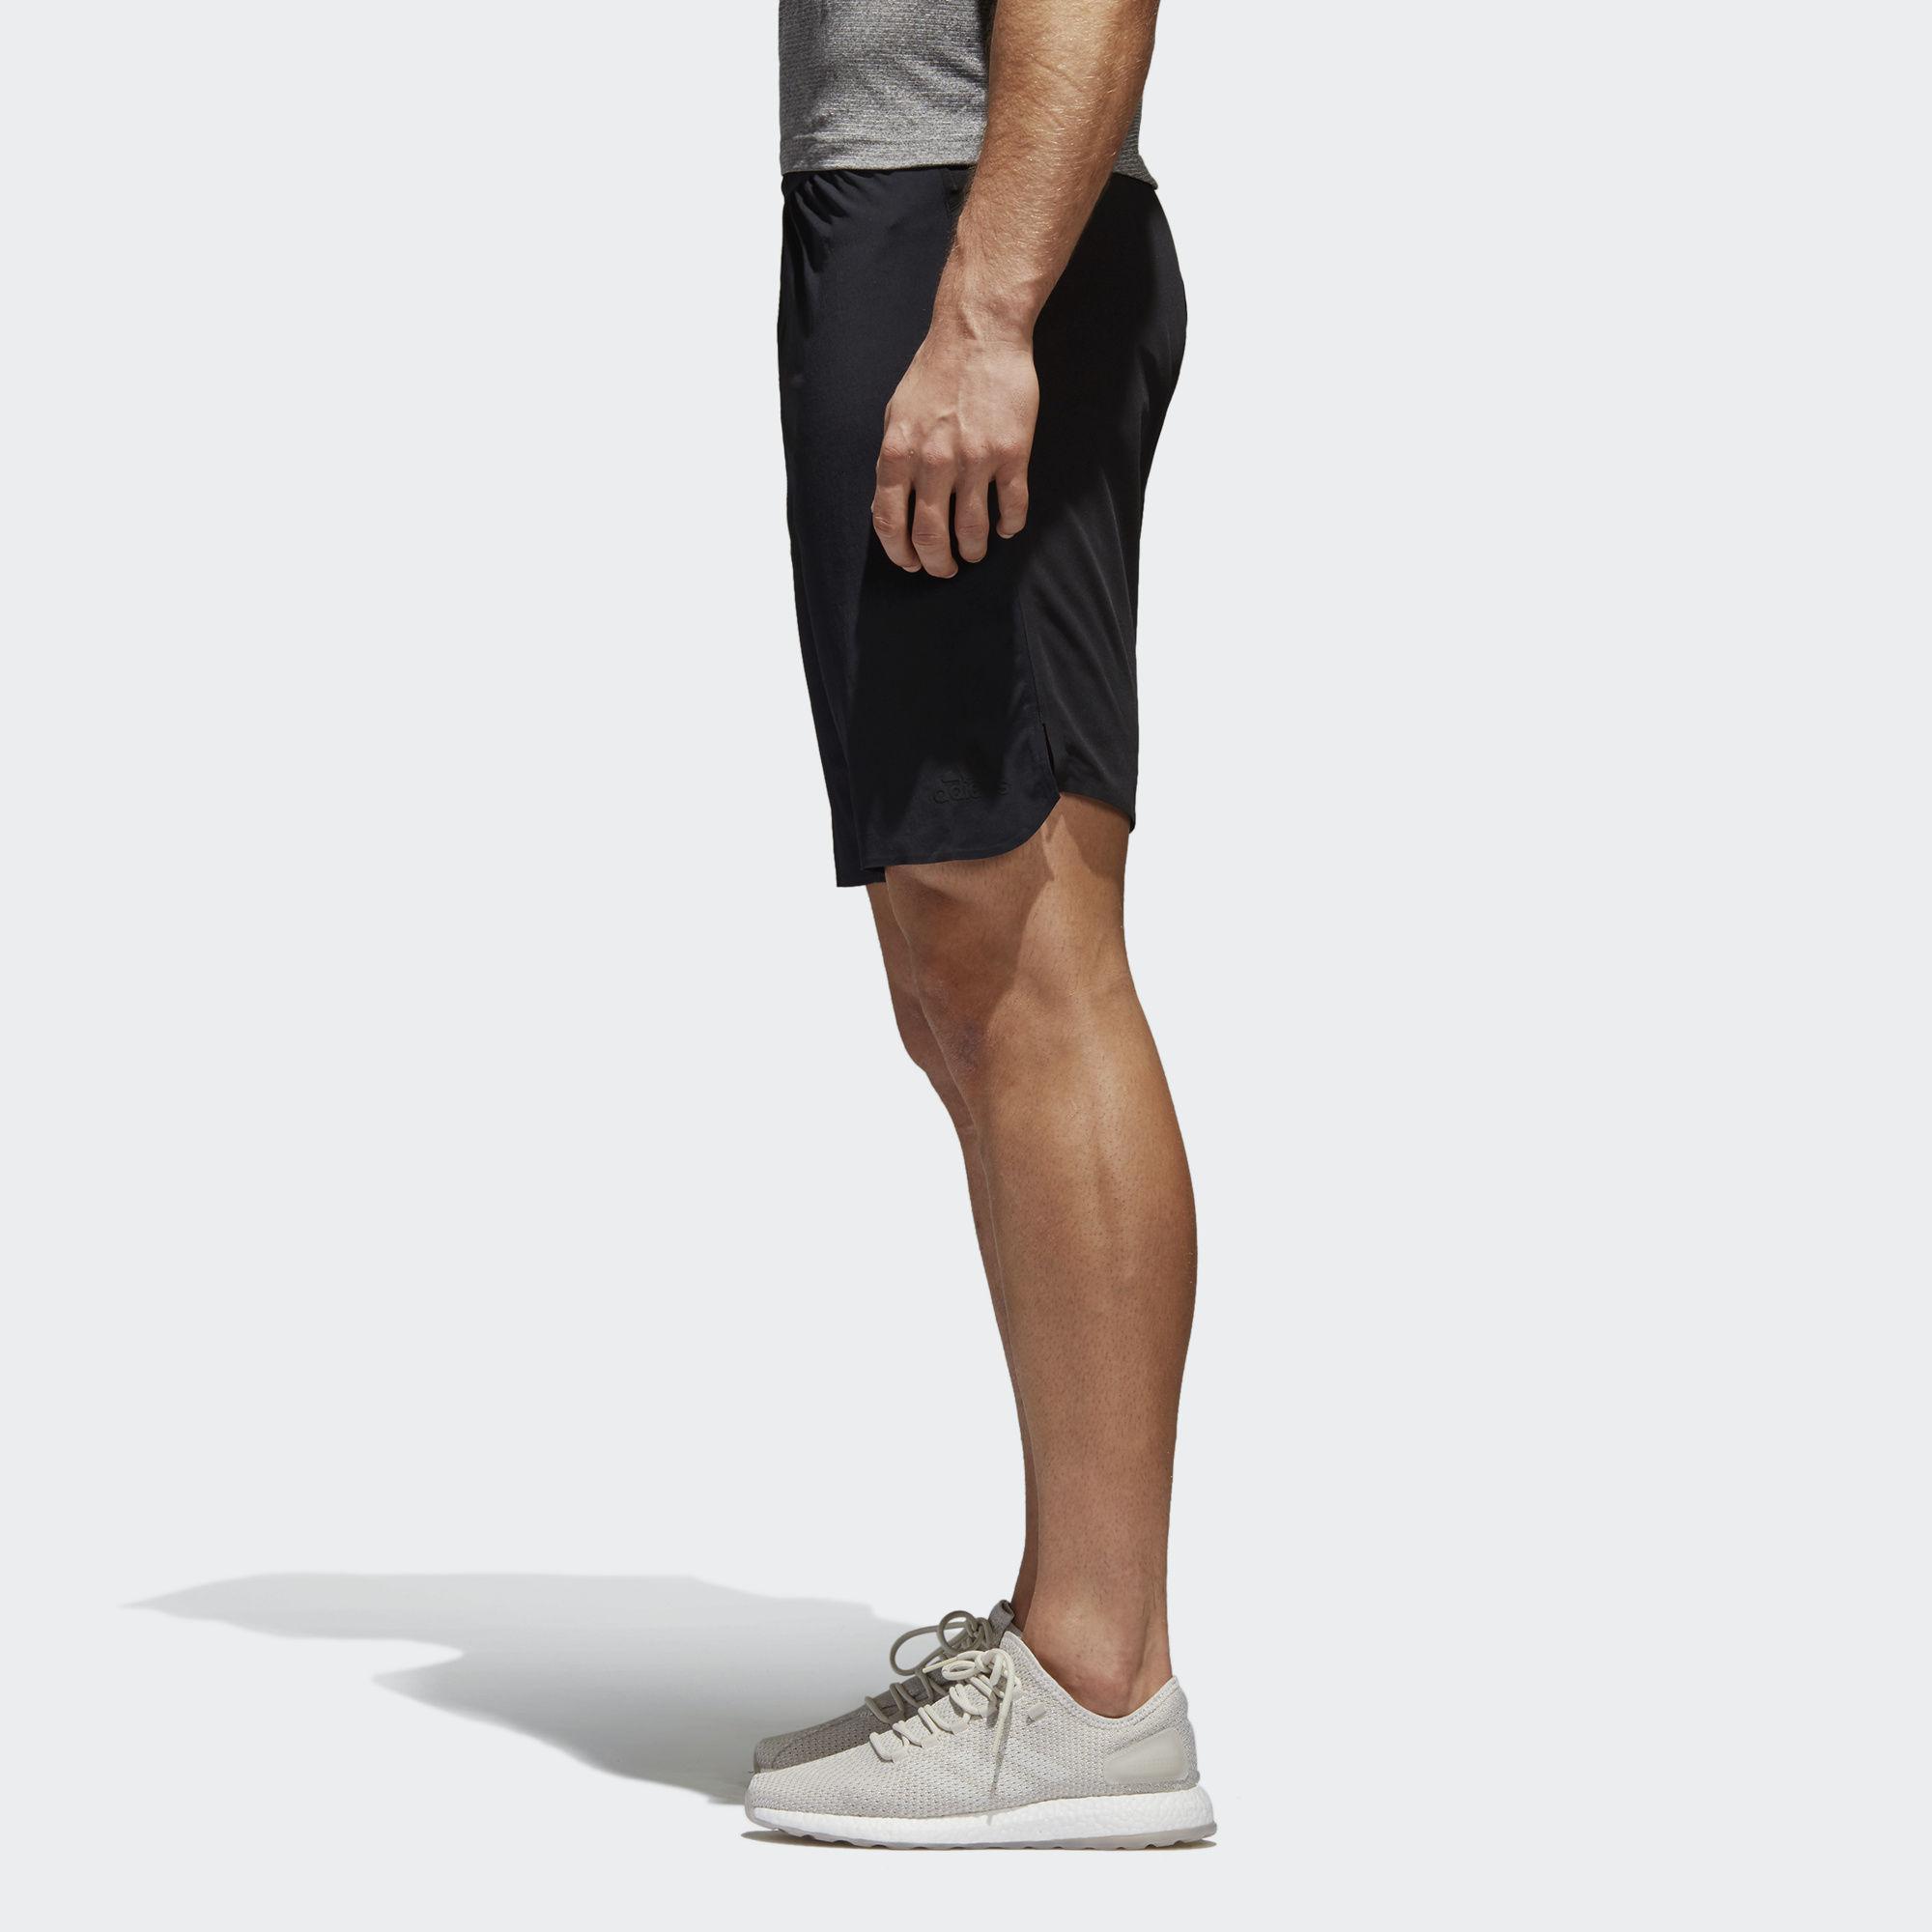 timeless design a65ab 86655 Adidas - Black 4krft Ultra-strong Shorts for Men - Lyst. View fullscreen